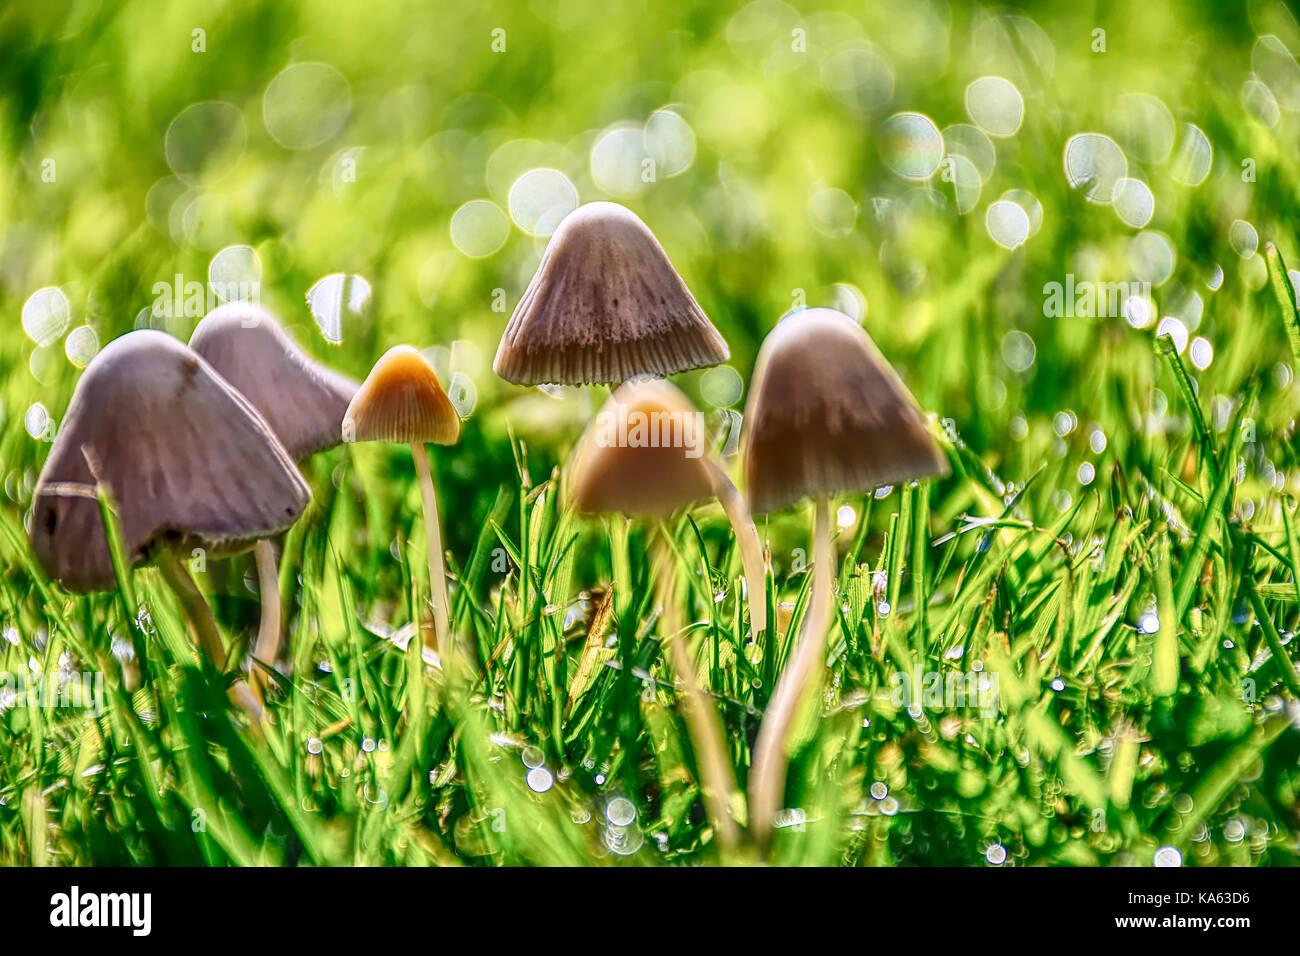 Fungi growth on grass field on sunny autumn morning after rain near Stoke on Trent ,United Kingdom. British nature,bokeh,mushrooms - Stock Image